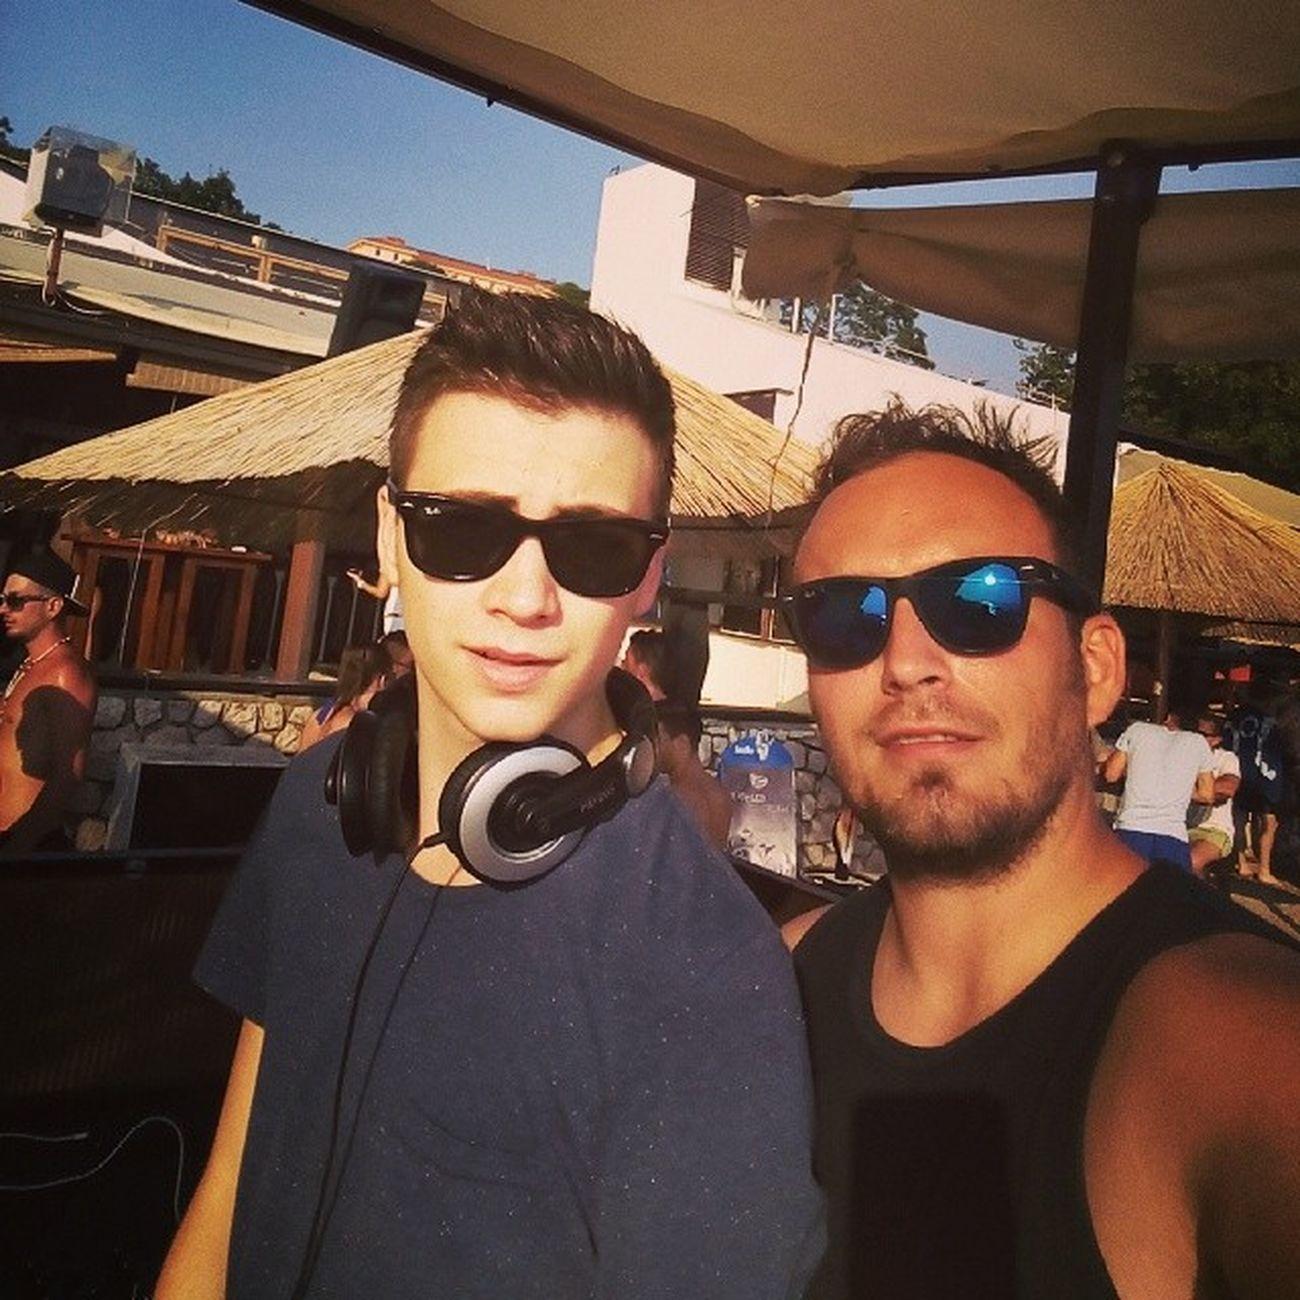 Dj Selfie Djselfie Crikvenica kataka party crikva sea seaside croatia odmor go fun sun rayban wayfarer @rayban